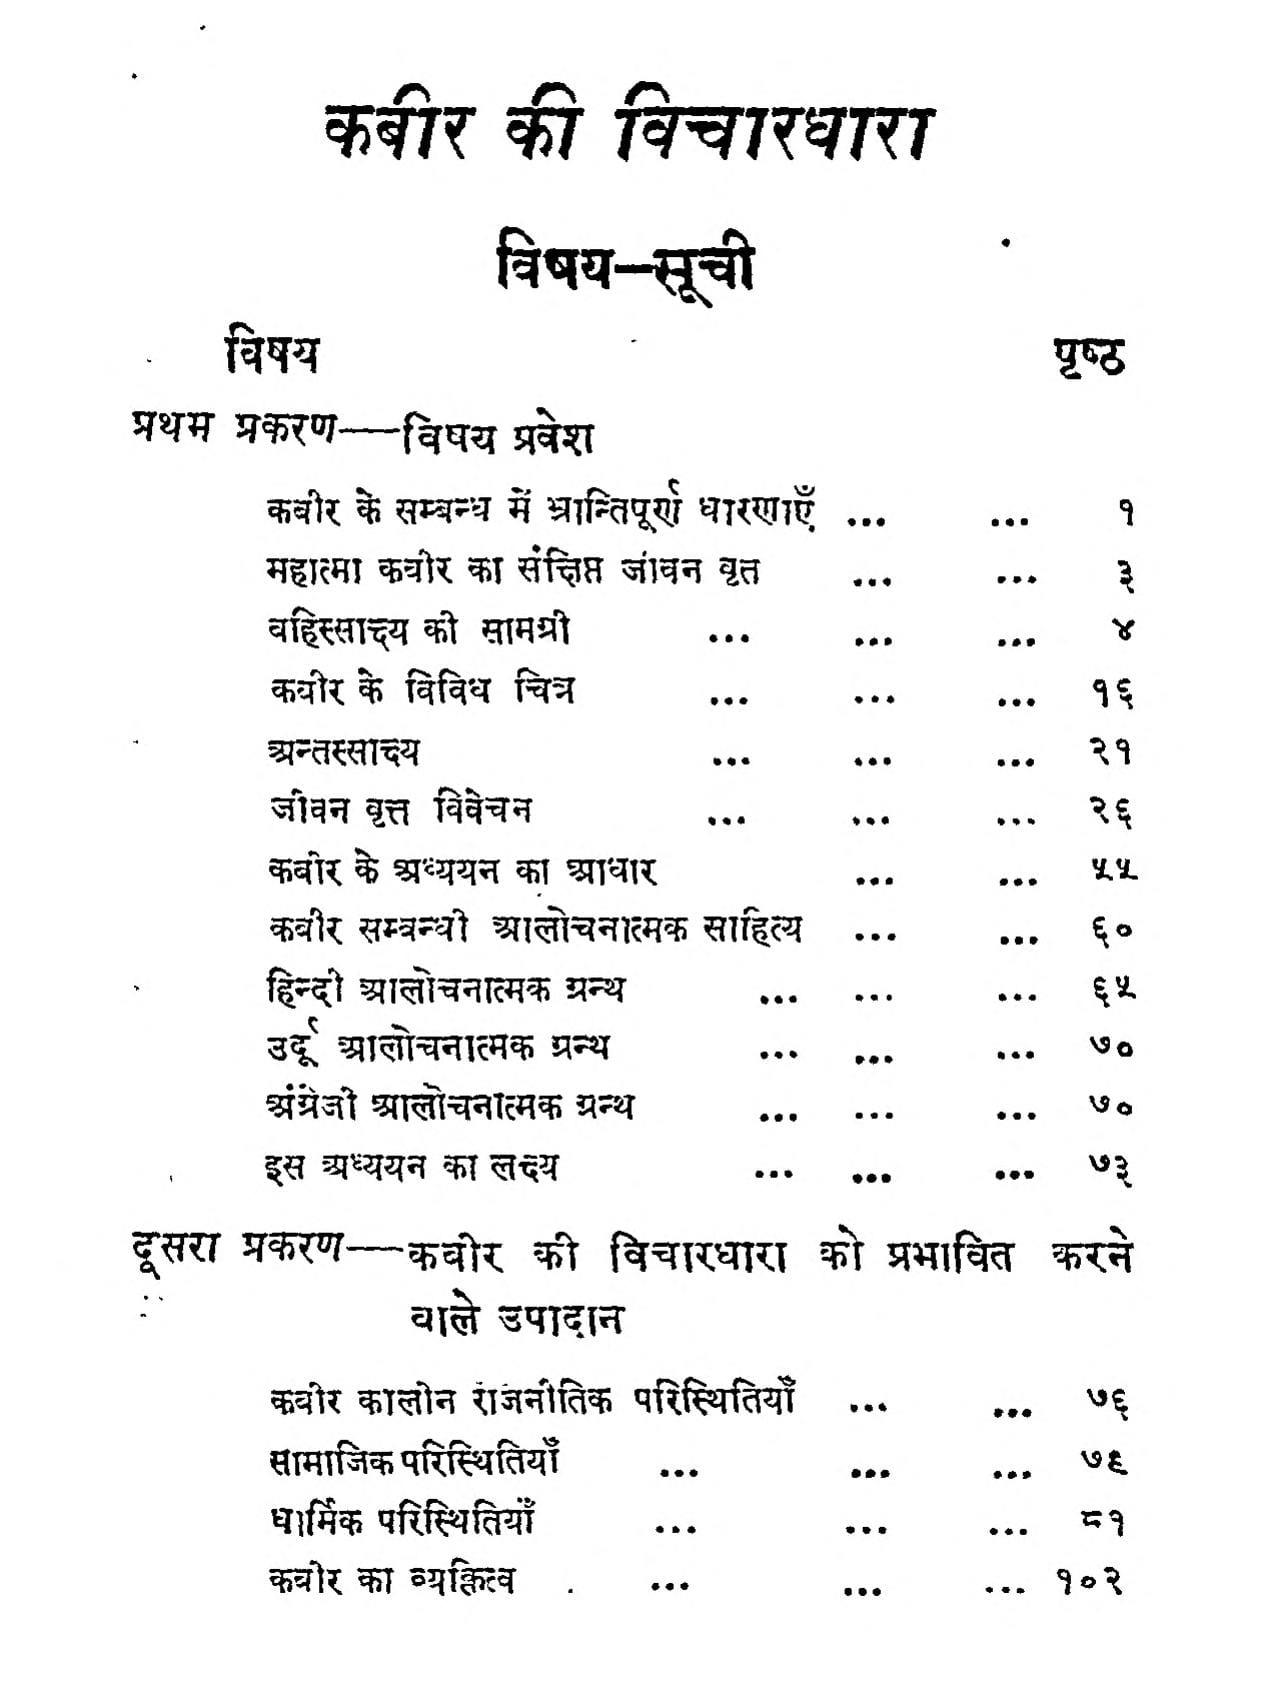 Book Image : कबीर की विचार धारा - Kabir Ki Vichar Dhara